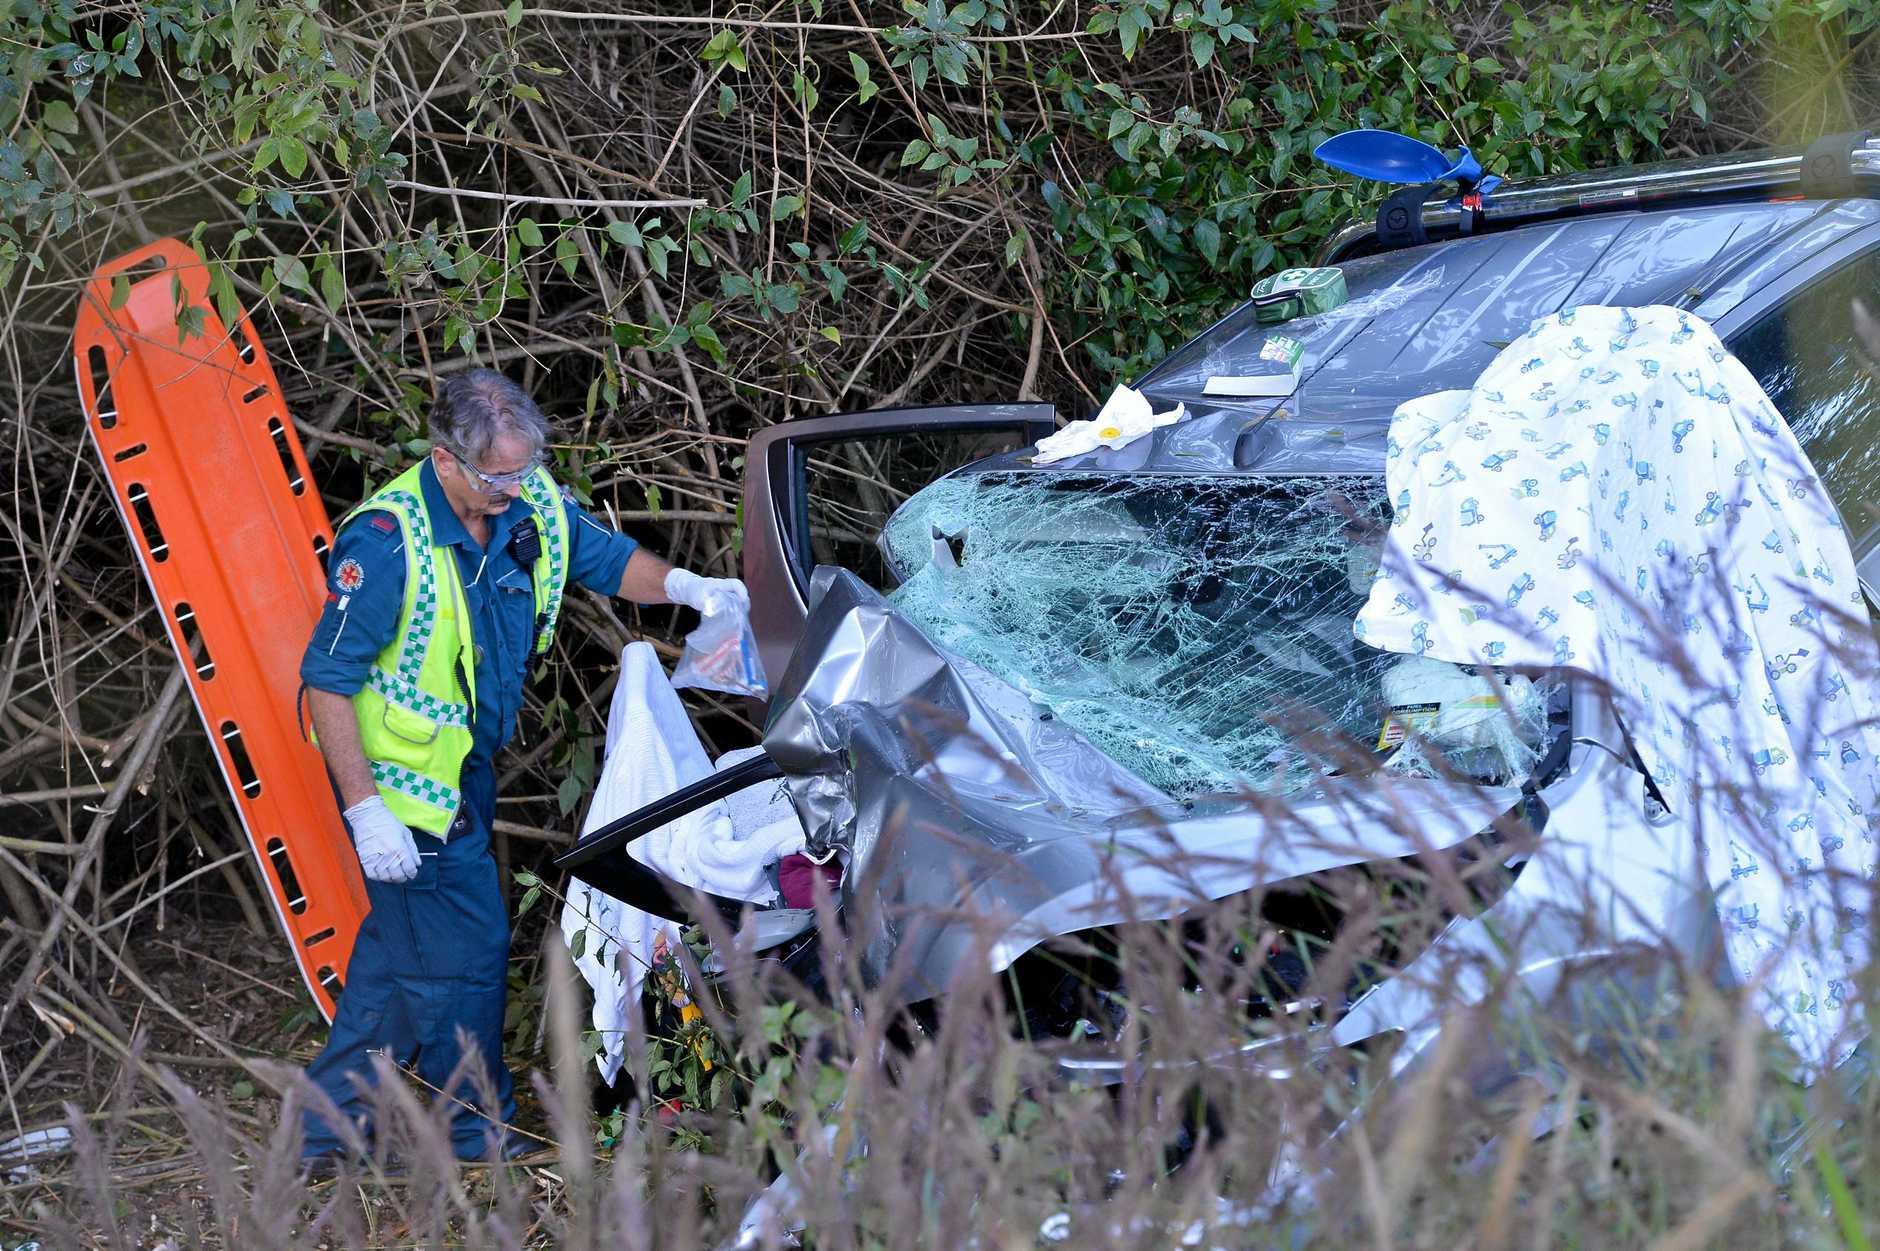 The scene of a fatal crash on Eumundi Noosa Rd were a man has died.